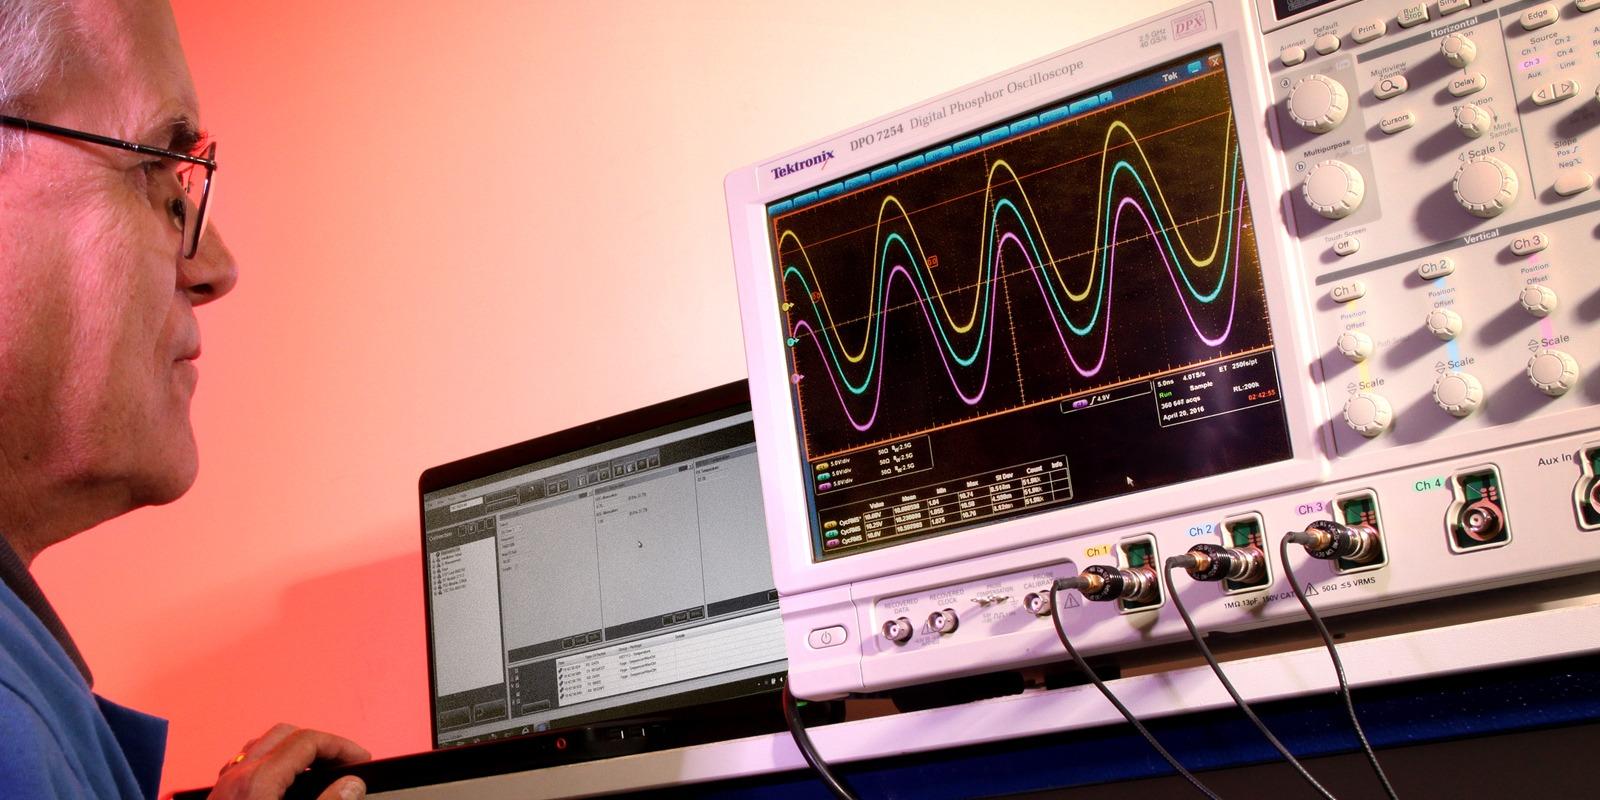 Interconics JTAG testing